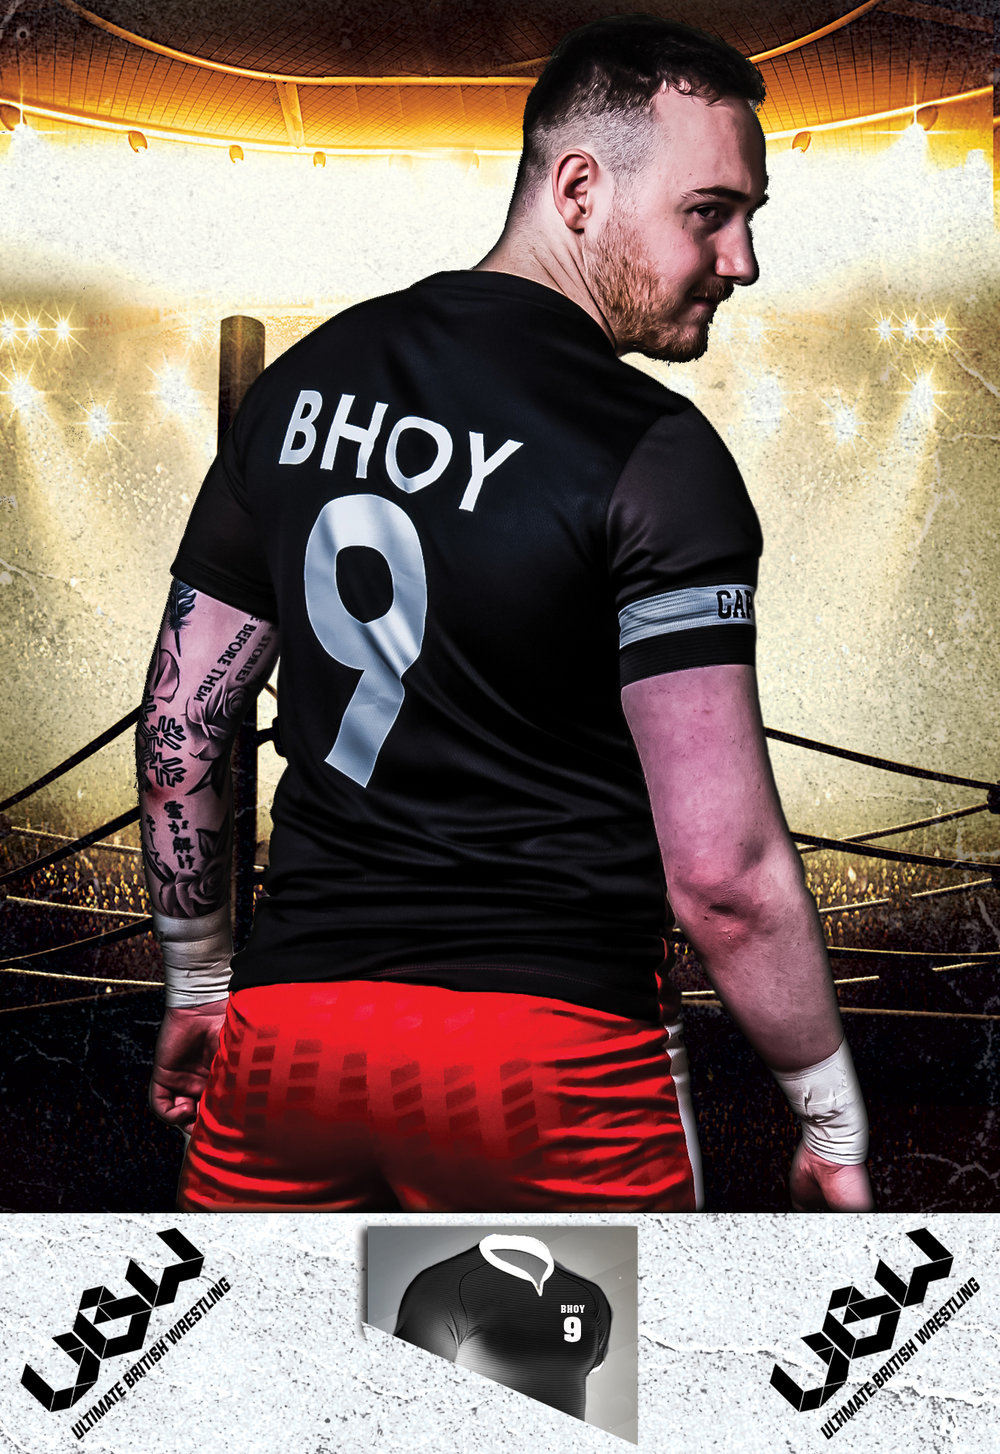 UBW Young Lions Champion - Robbie Bhoy